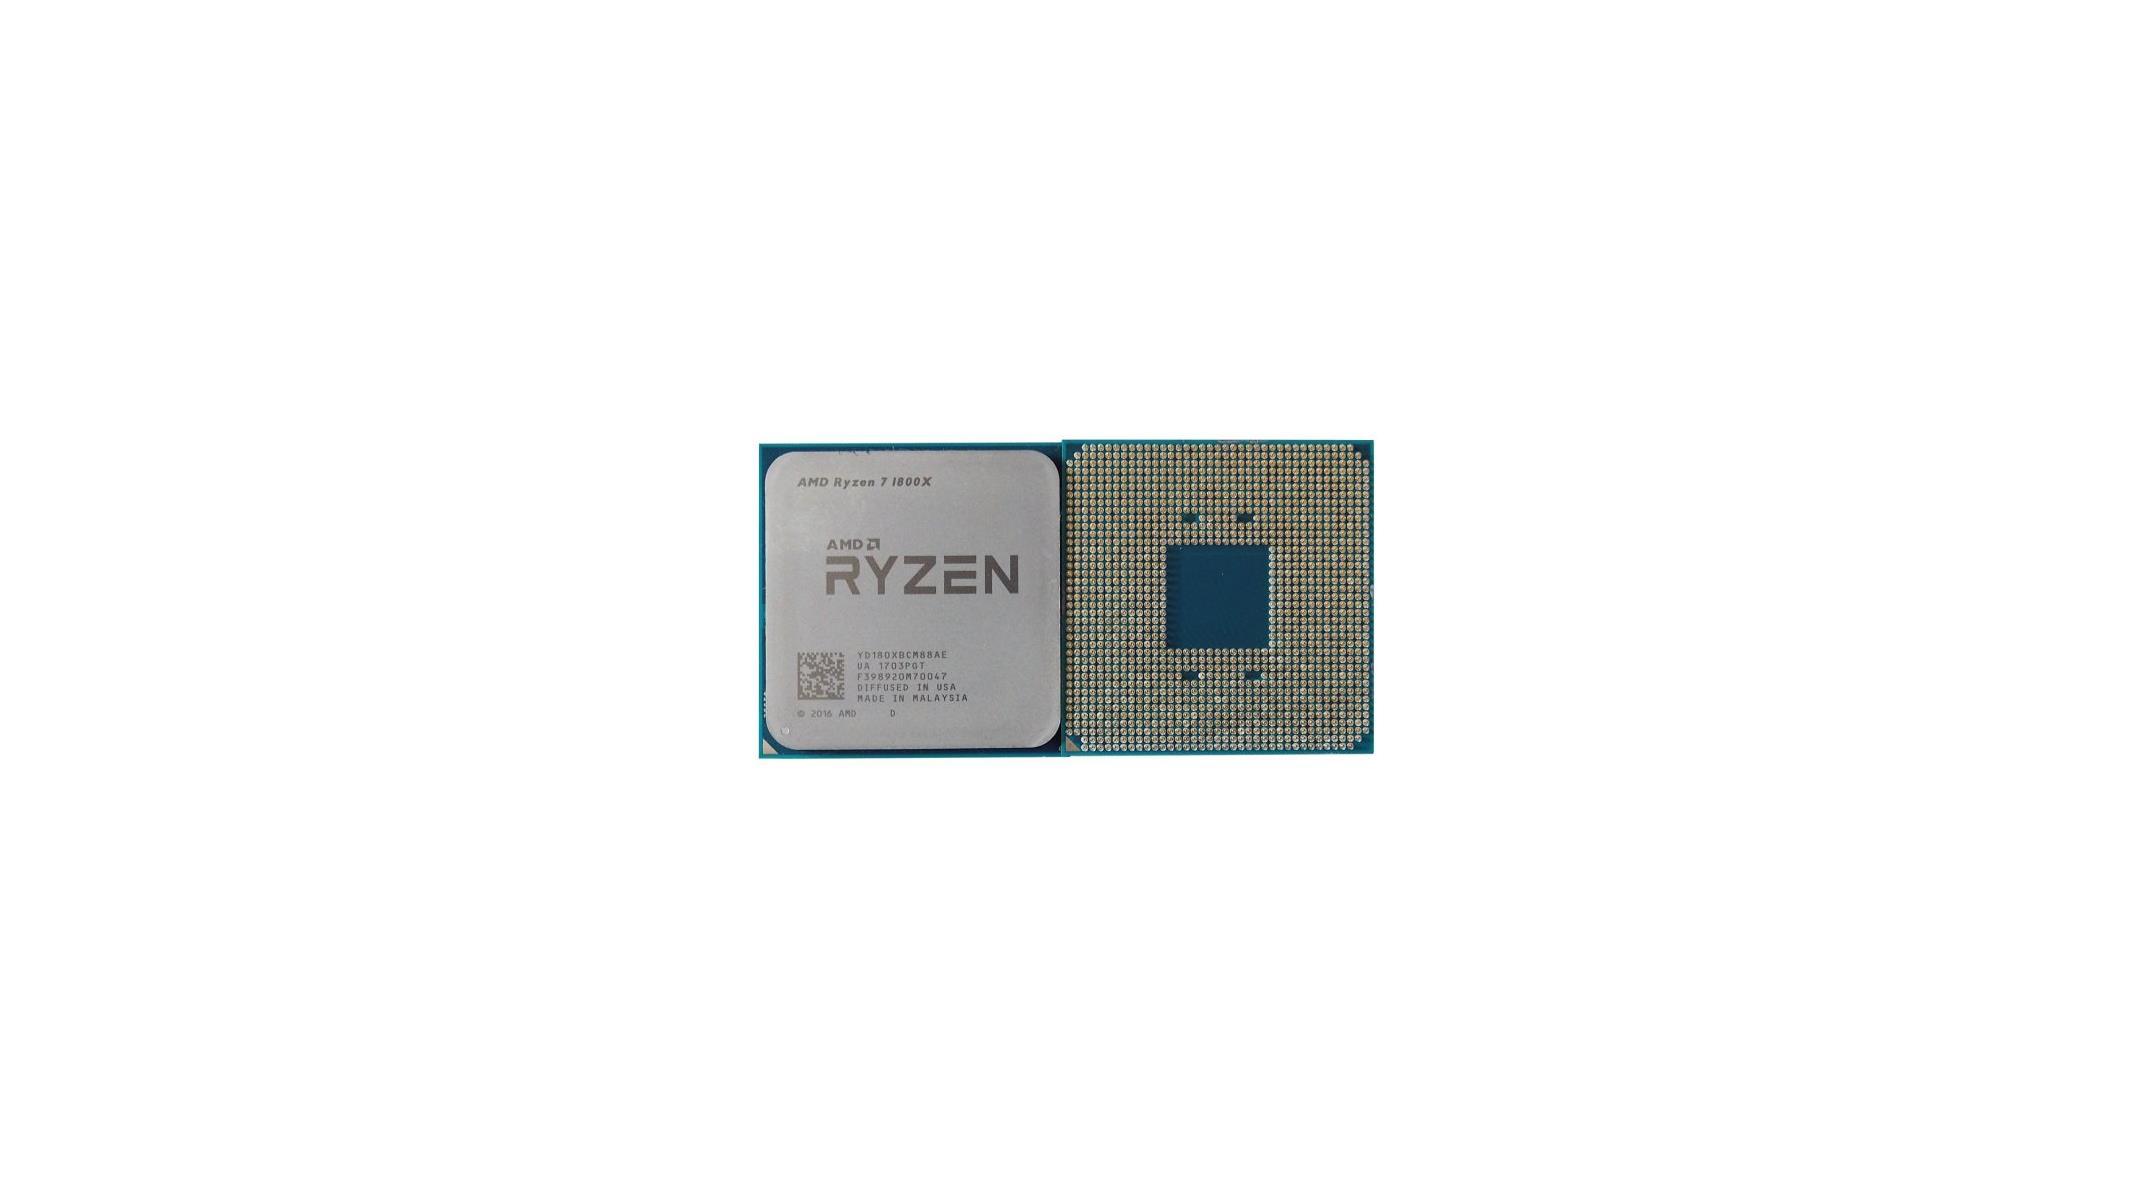 AMD Ryzen System Tweaking Tips For Optimal Gaming, Overclocking And